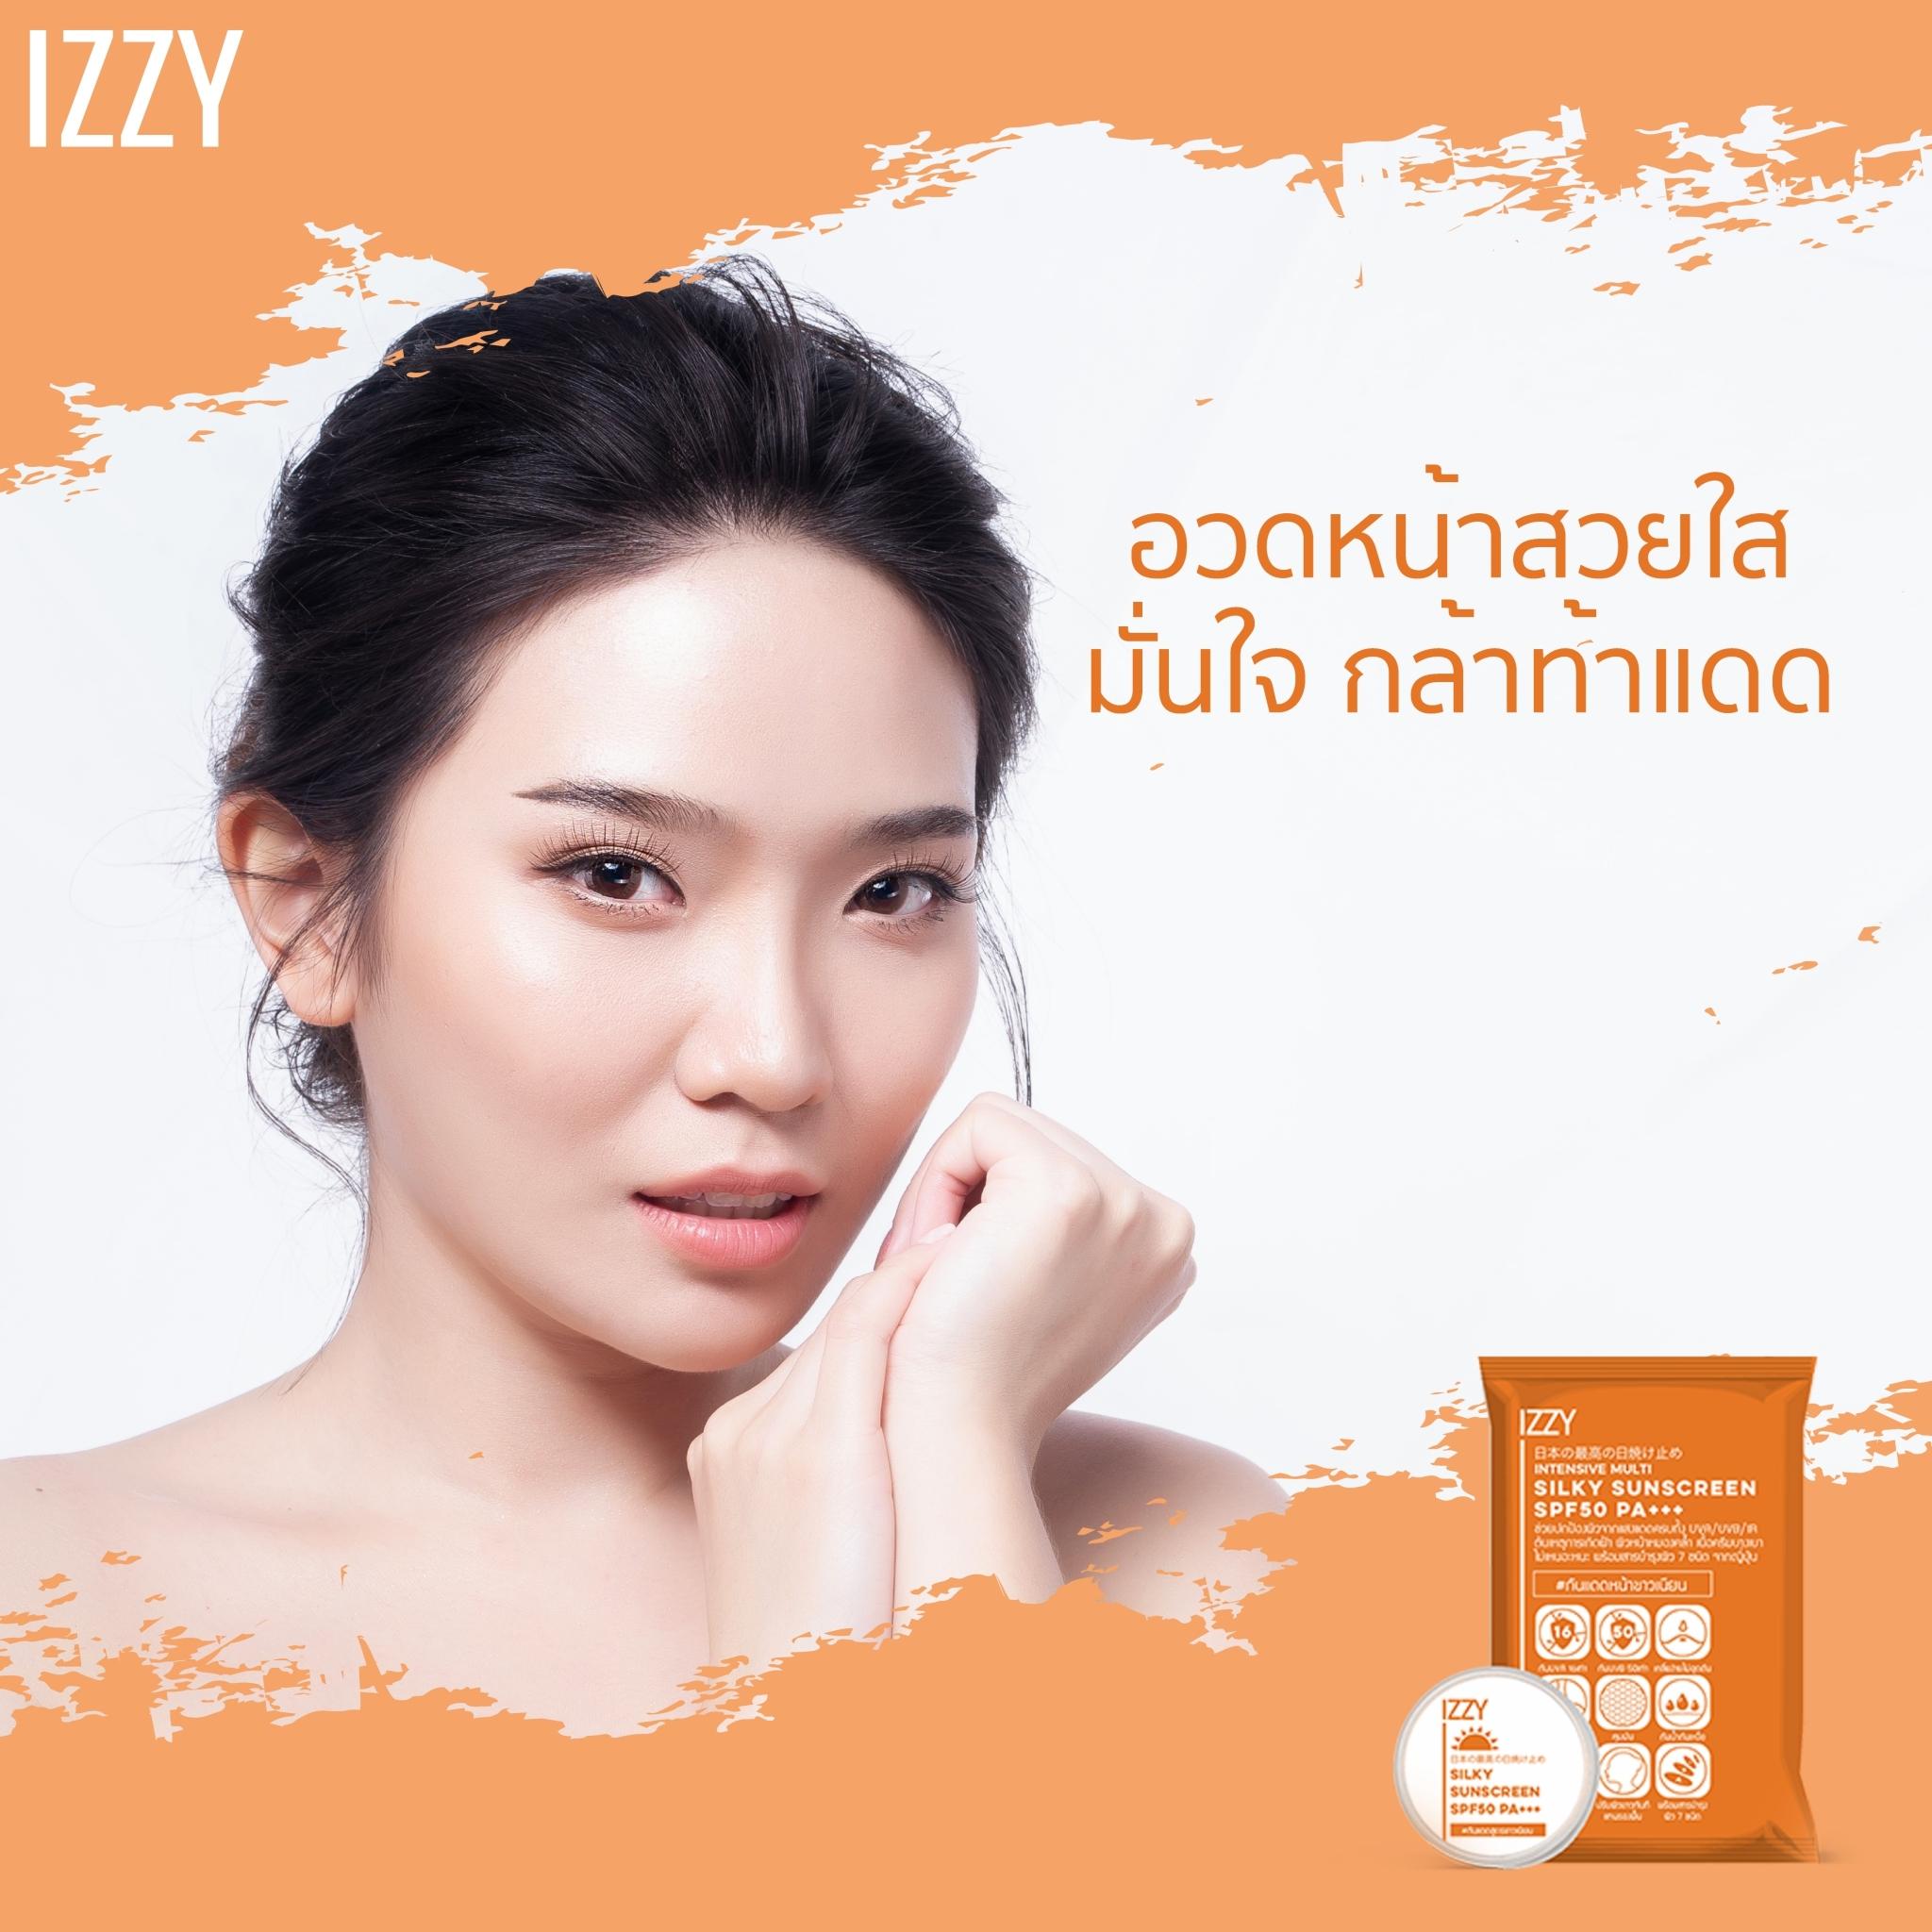 IZZY Silky Sunscreen SPF50 PA+++ - อิซซี่ ครีมกันแดด (5 กรัม)